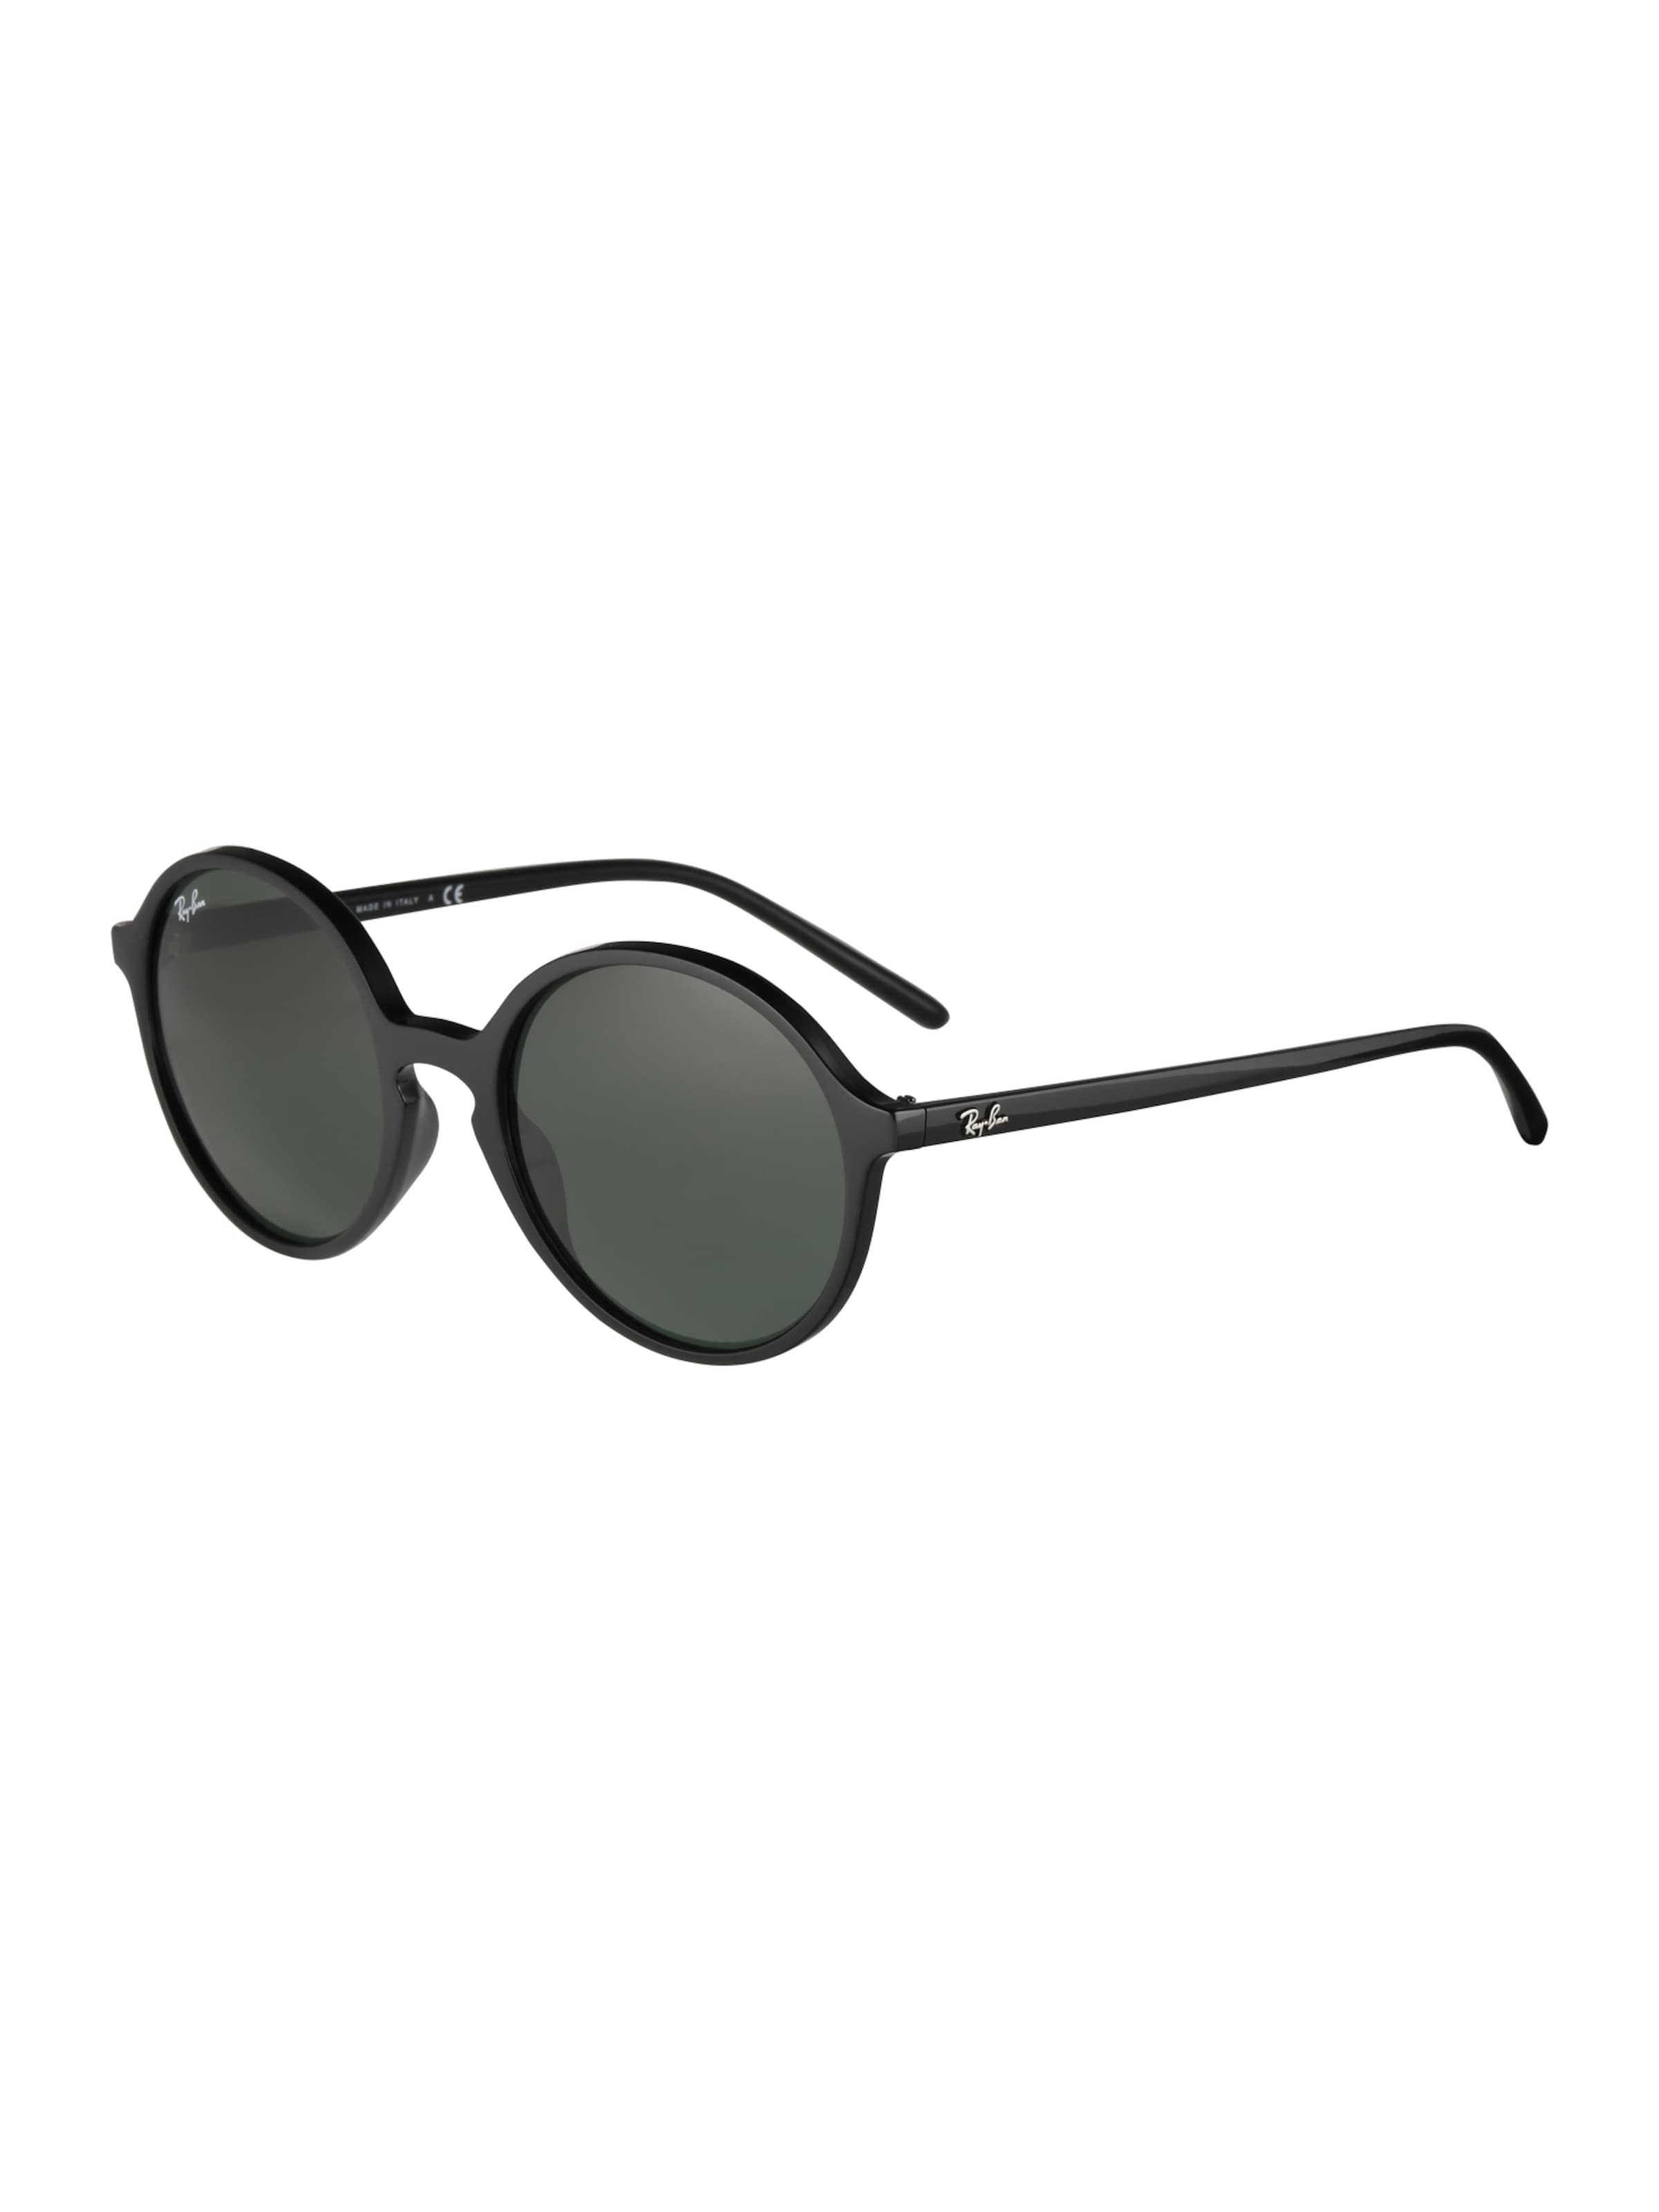 Ray-Ban Solglasögon i svart